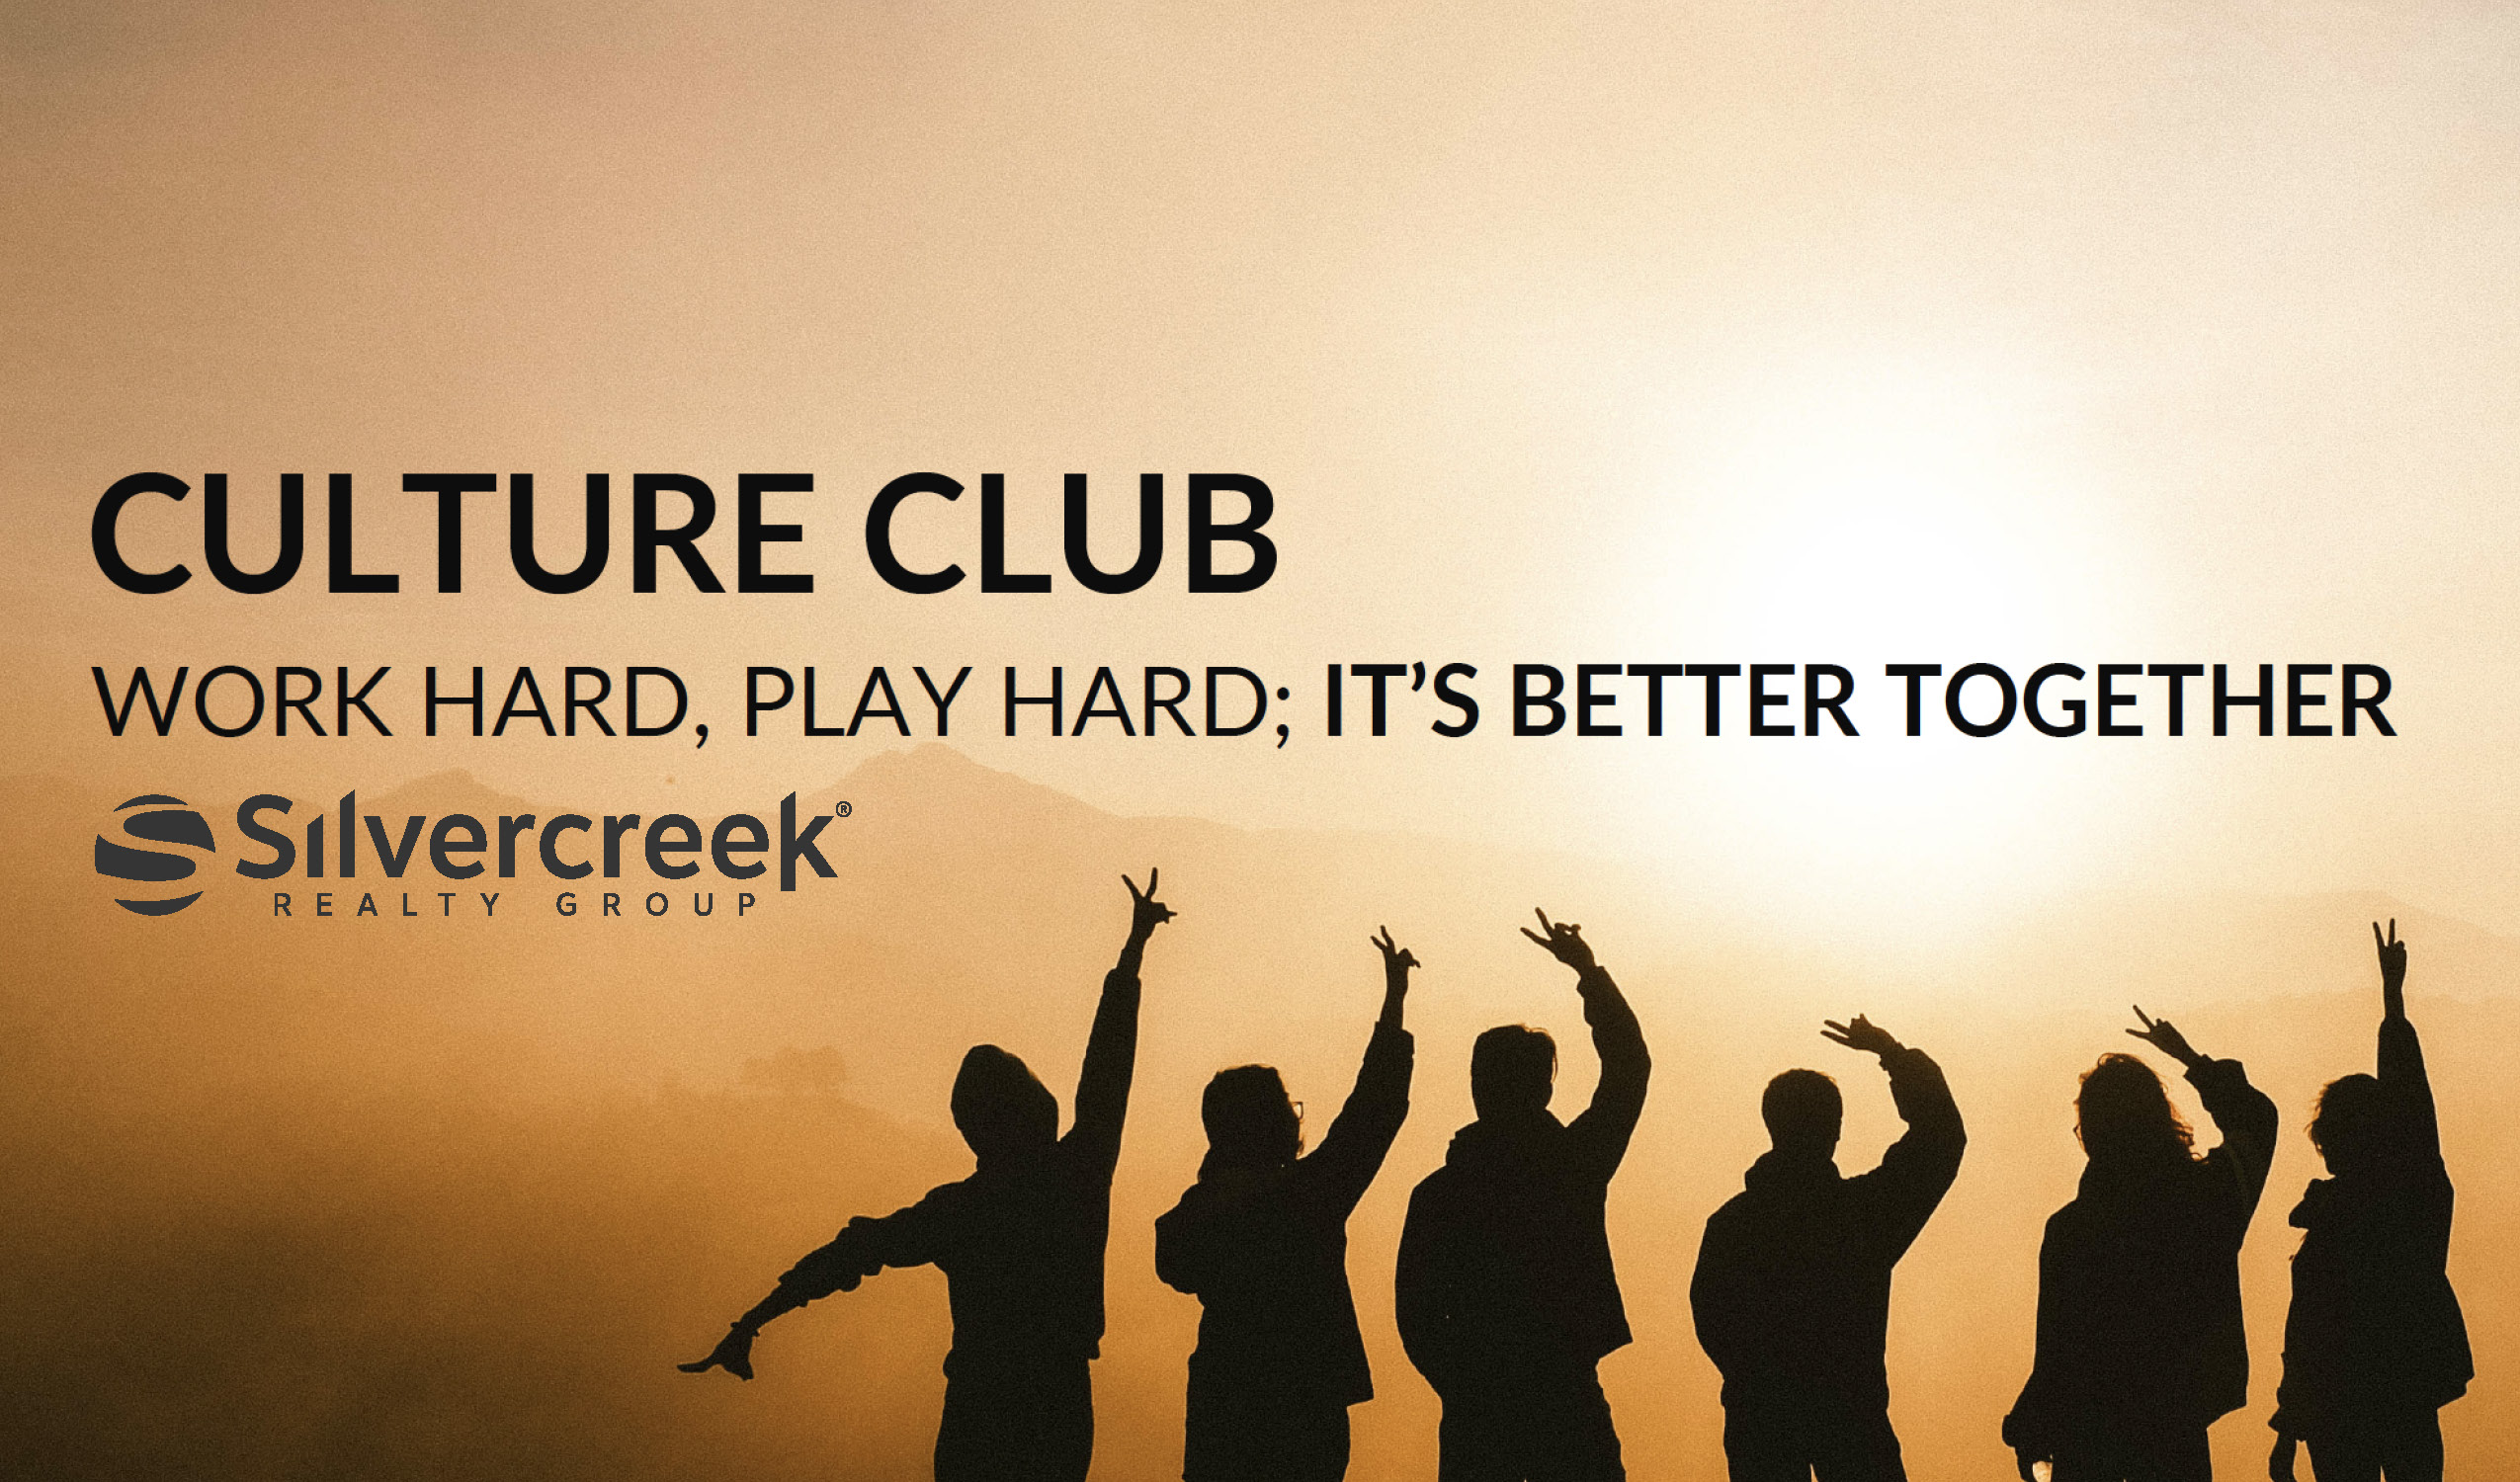 Introducing Culture Club